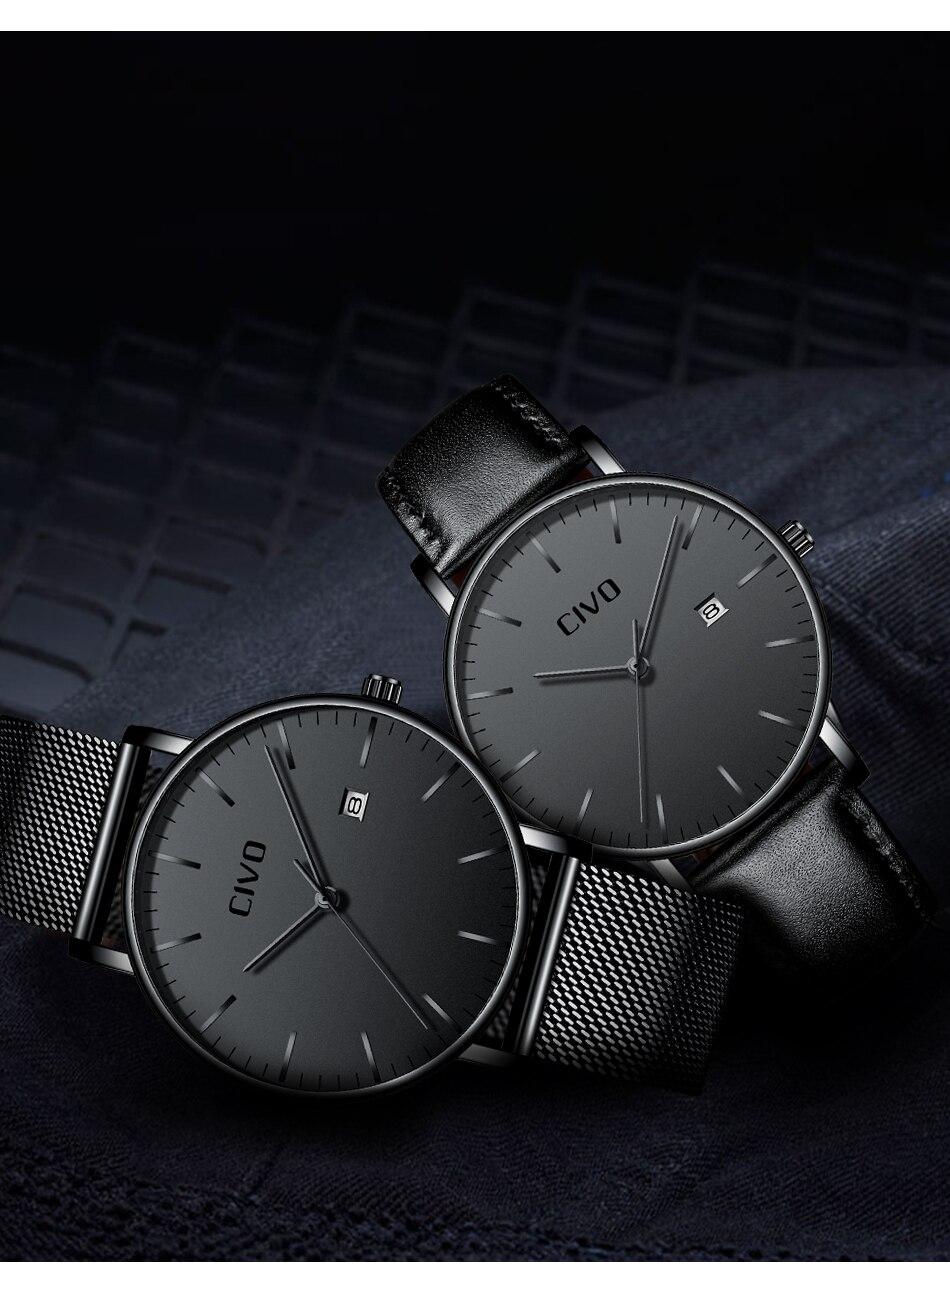 CIVO Men Watch Ultra Thin Minimalist Waterproof Date Wrist Watch For Men Black Genuine Leather Business Fashion Watch Men Clock 10